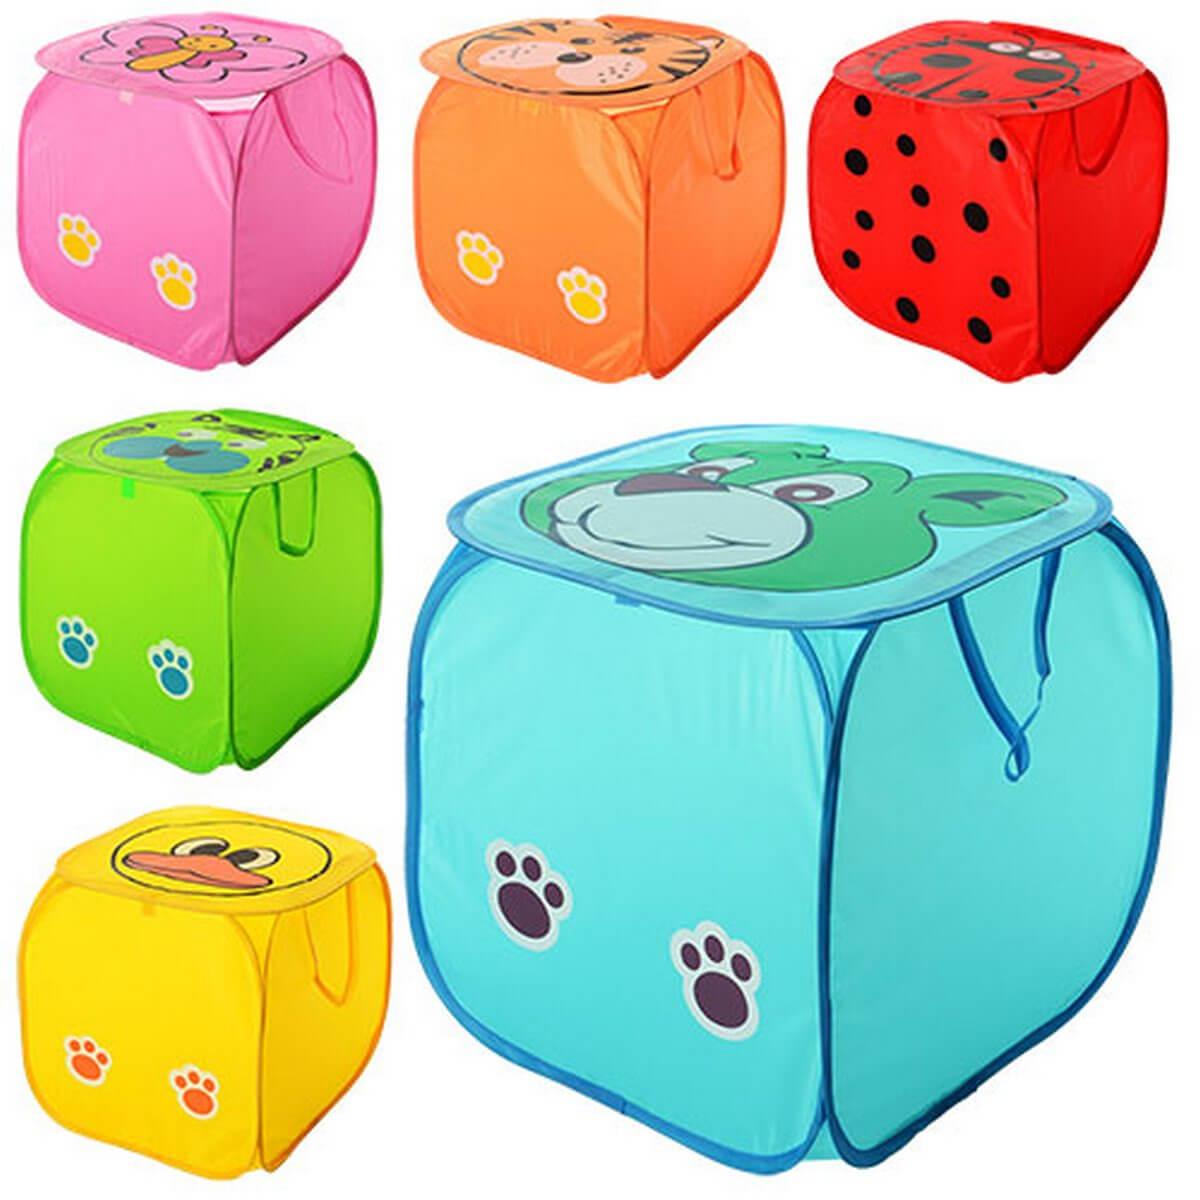 bk toys ltd. Корзина для игрушек с животным M 2508